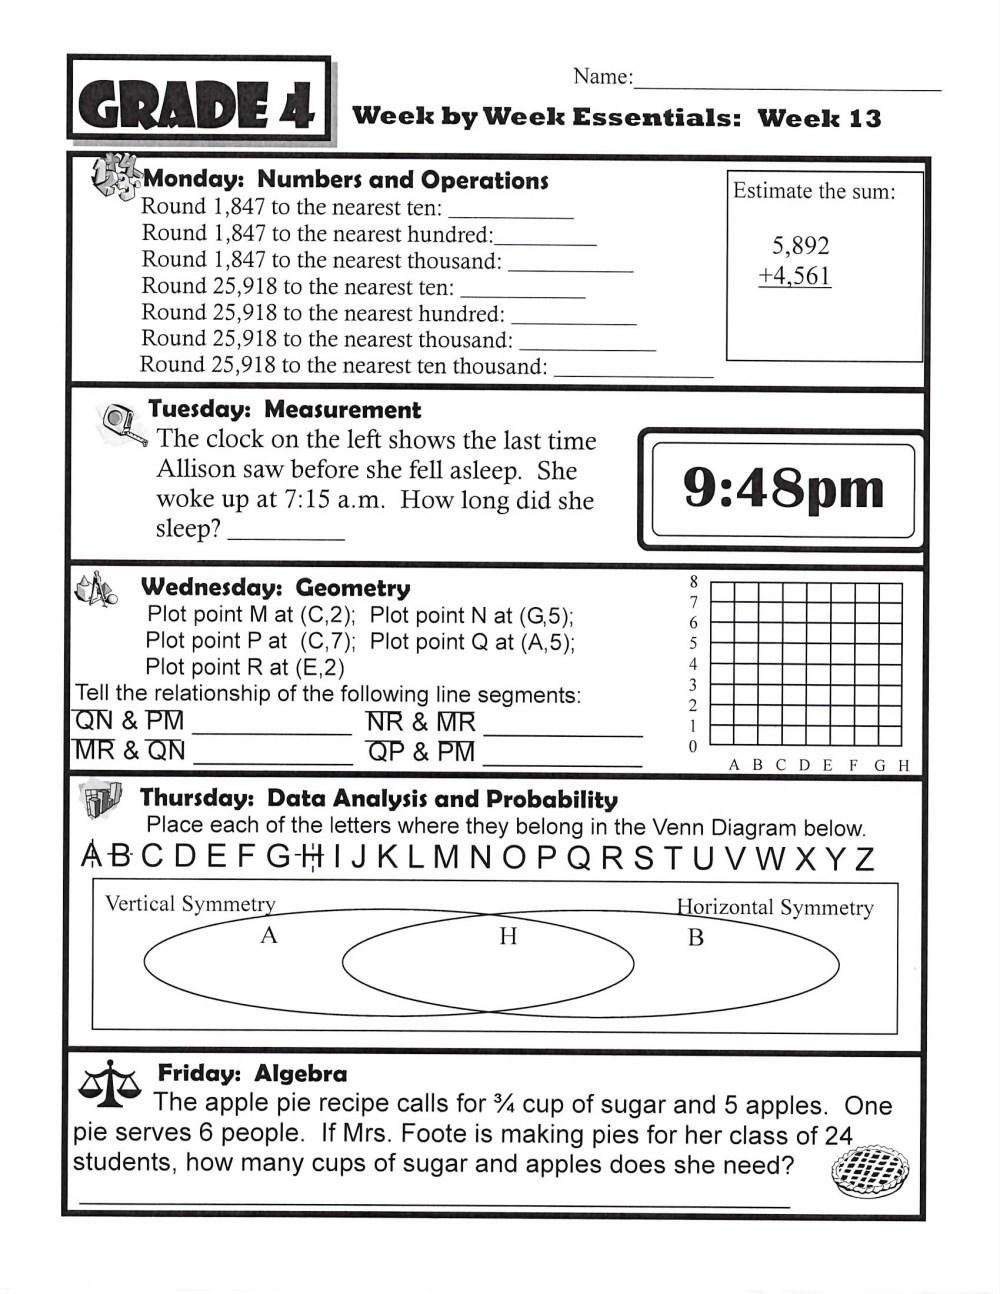 medium resolution of Homework Help For Grade 7-10 Math Students! 7th Grade Math Homework Help